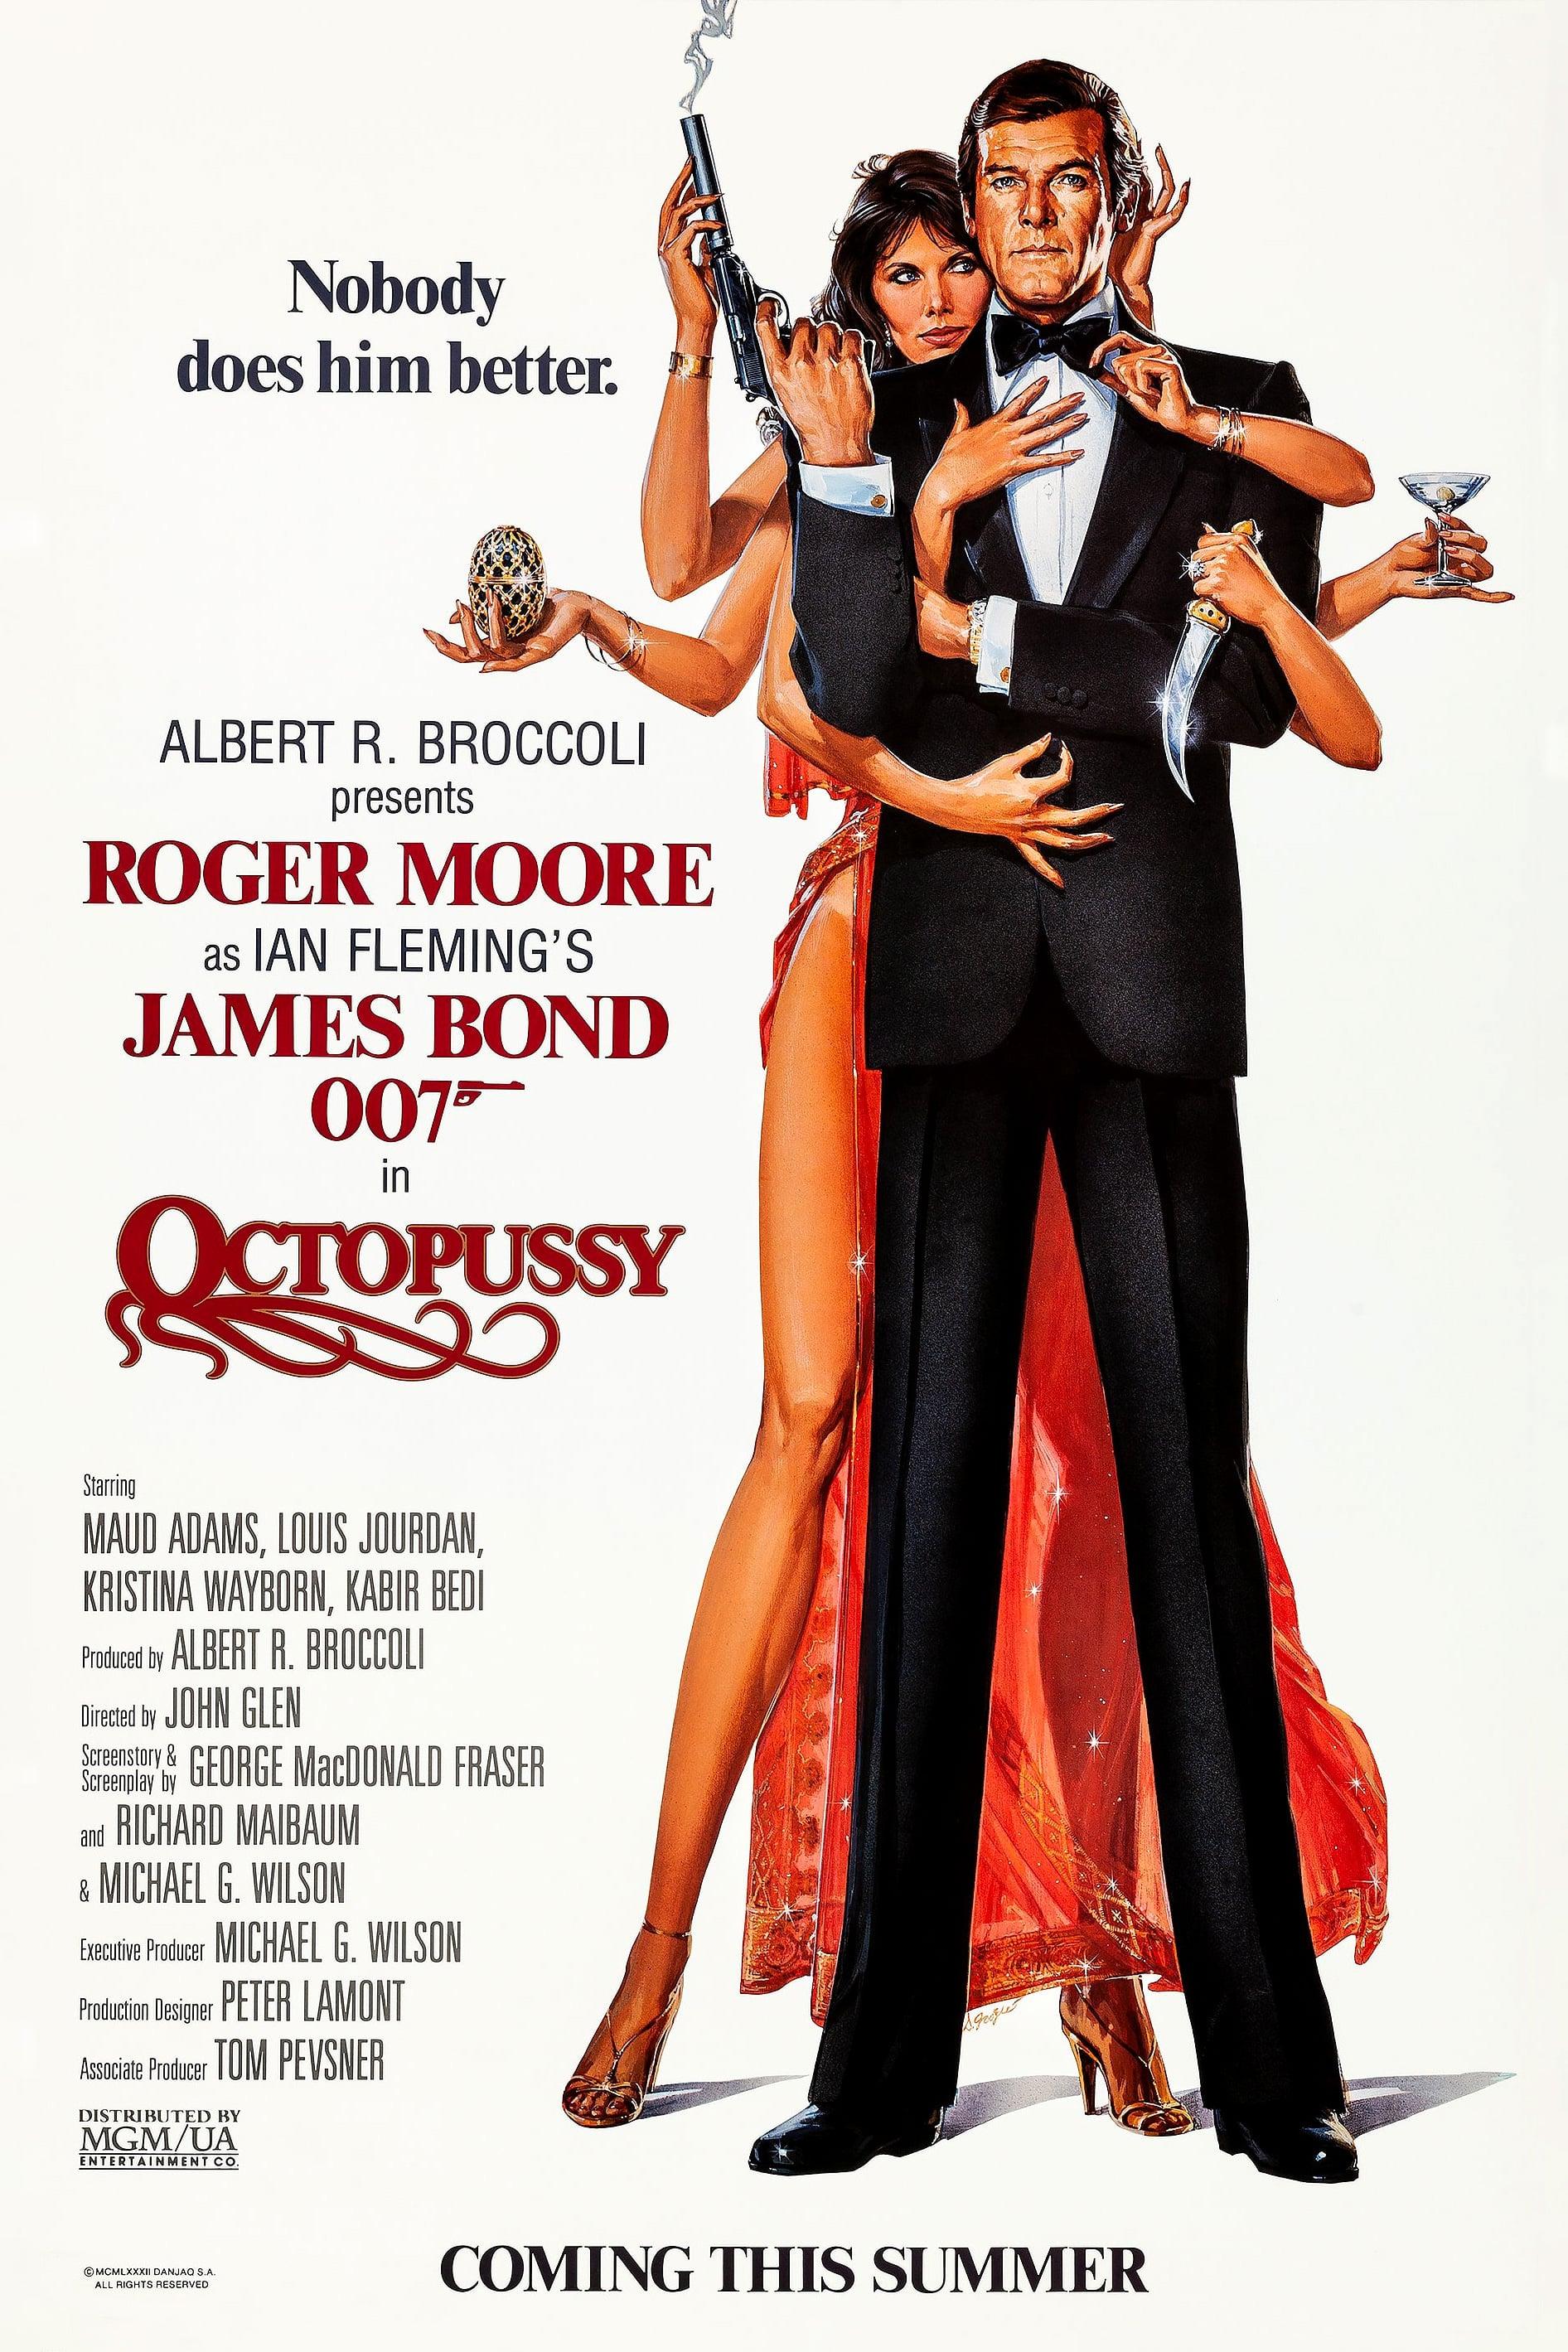 Octopussy (film) | James Bond Wiki | Fandom